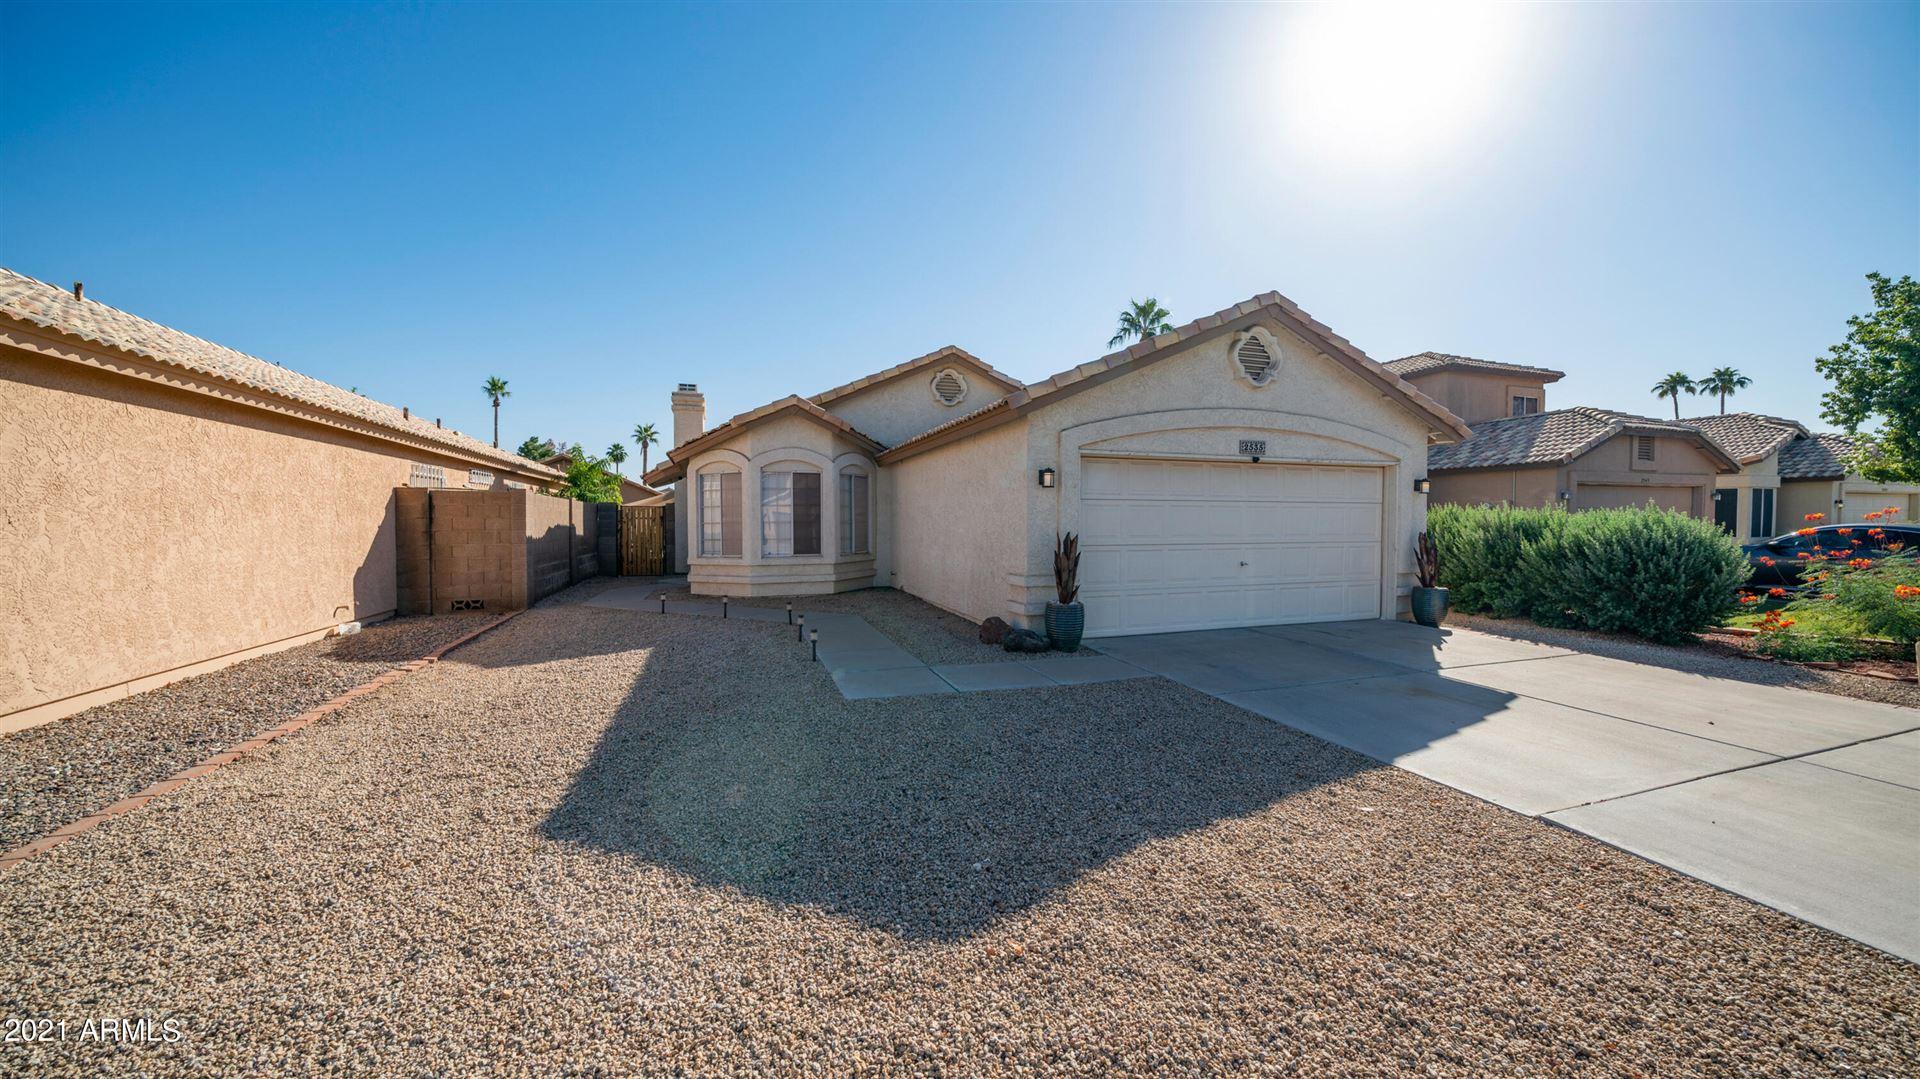 Photo of 2535 W ORCHID Lane, Chandler, AZ 85224 (MLS # 6303284)